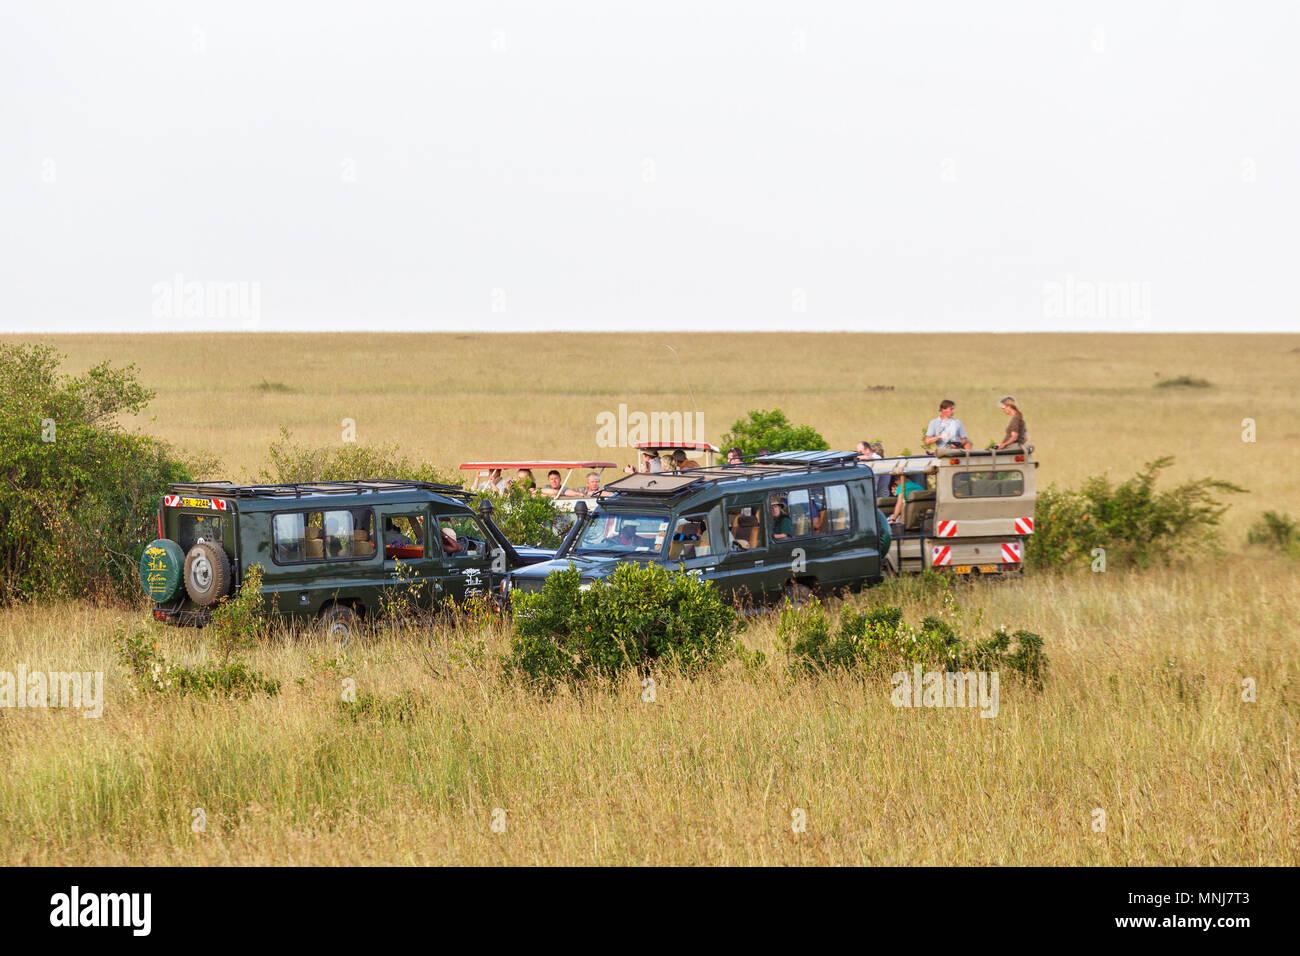 Safari game drive on the savannah in Masai Mara, Kenya - Stock Image